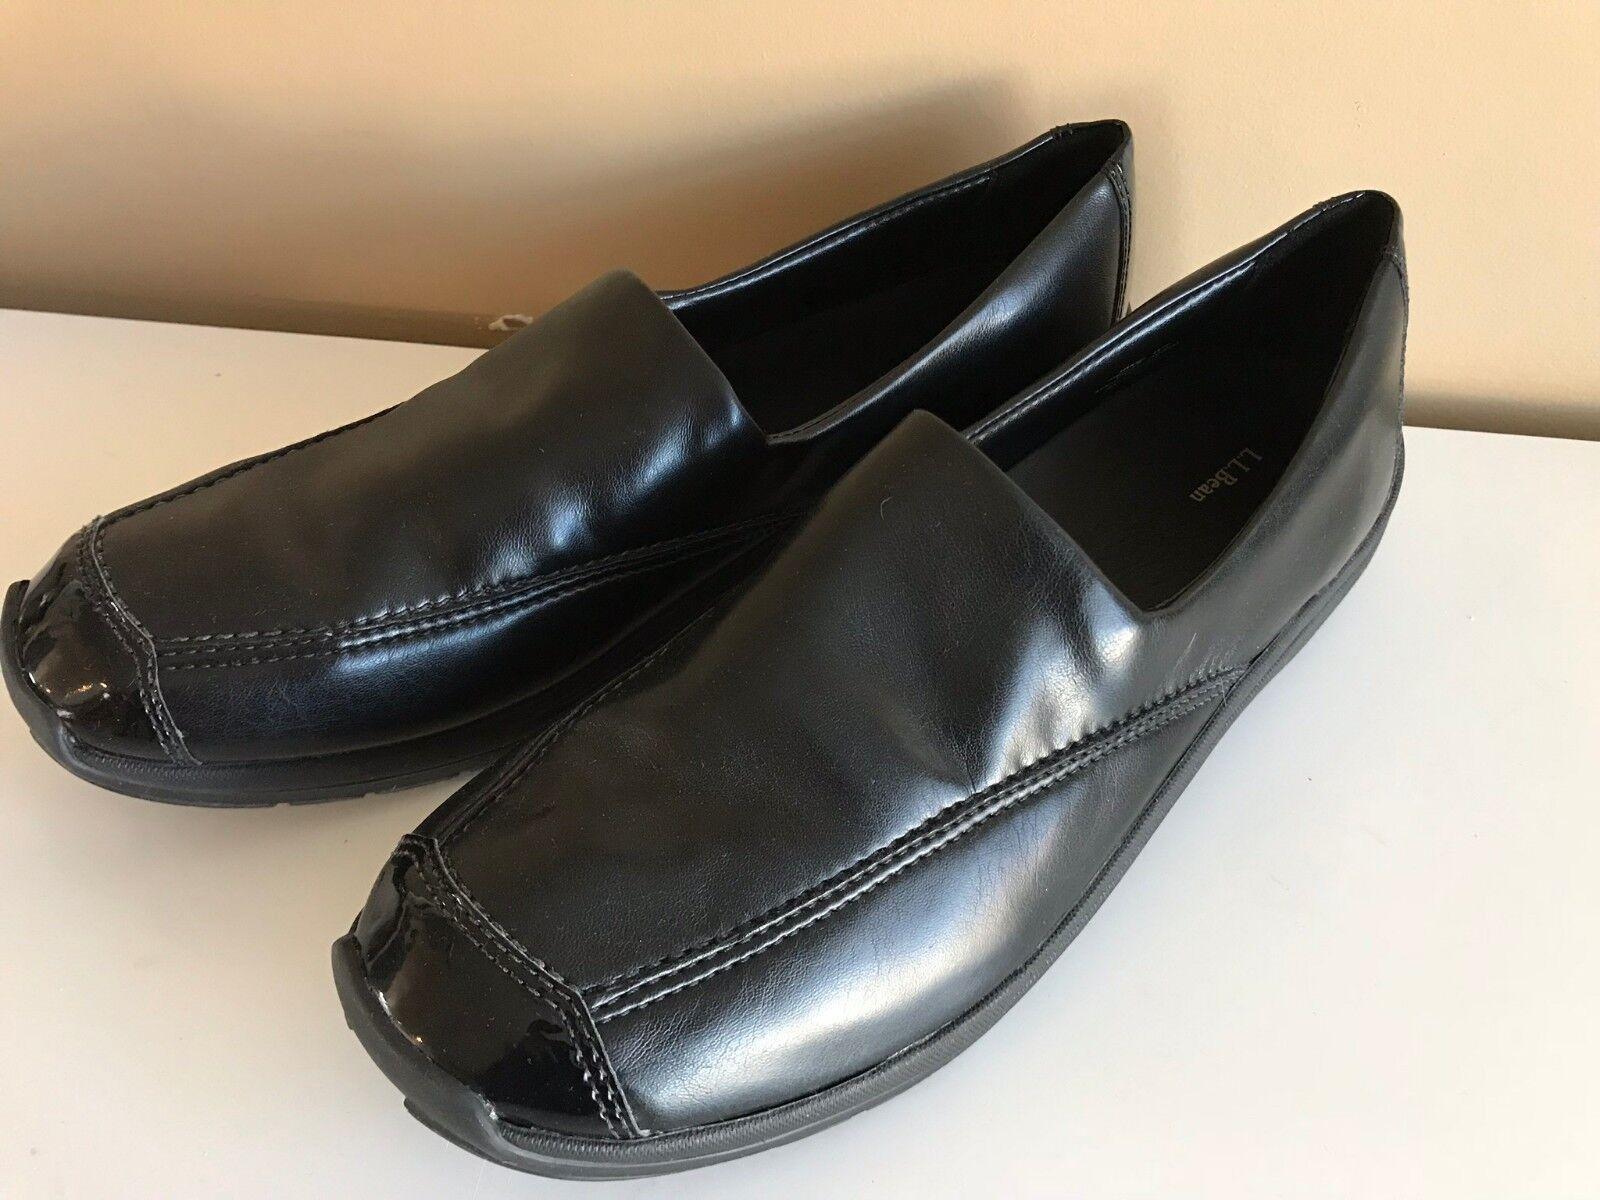 Ll Bean Mocasín Zapatos para mujer negro negro negro 7f8abf